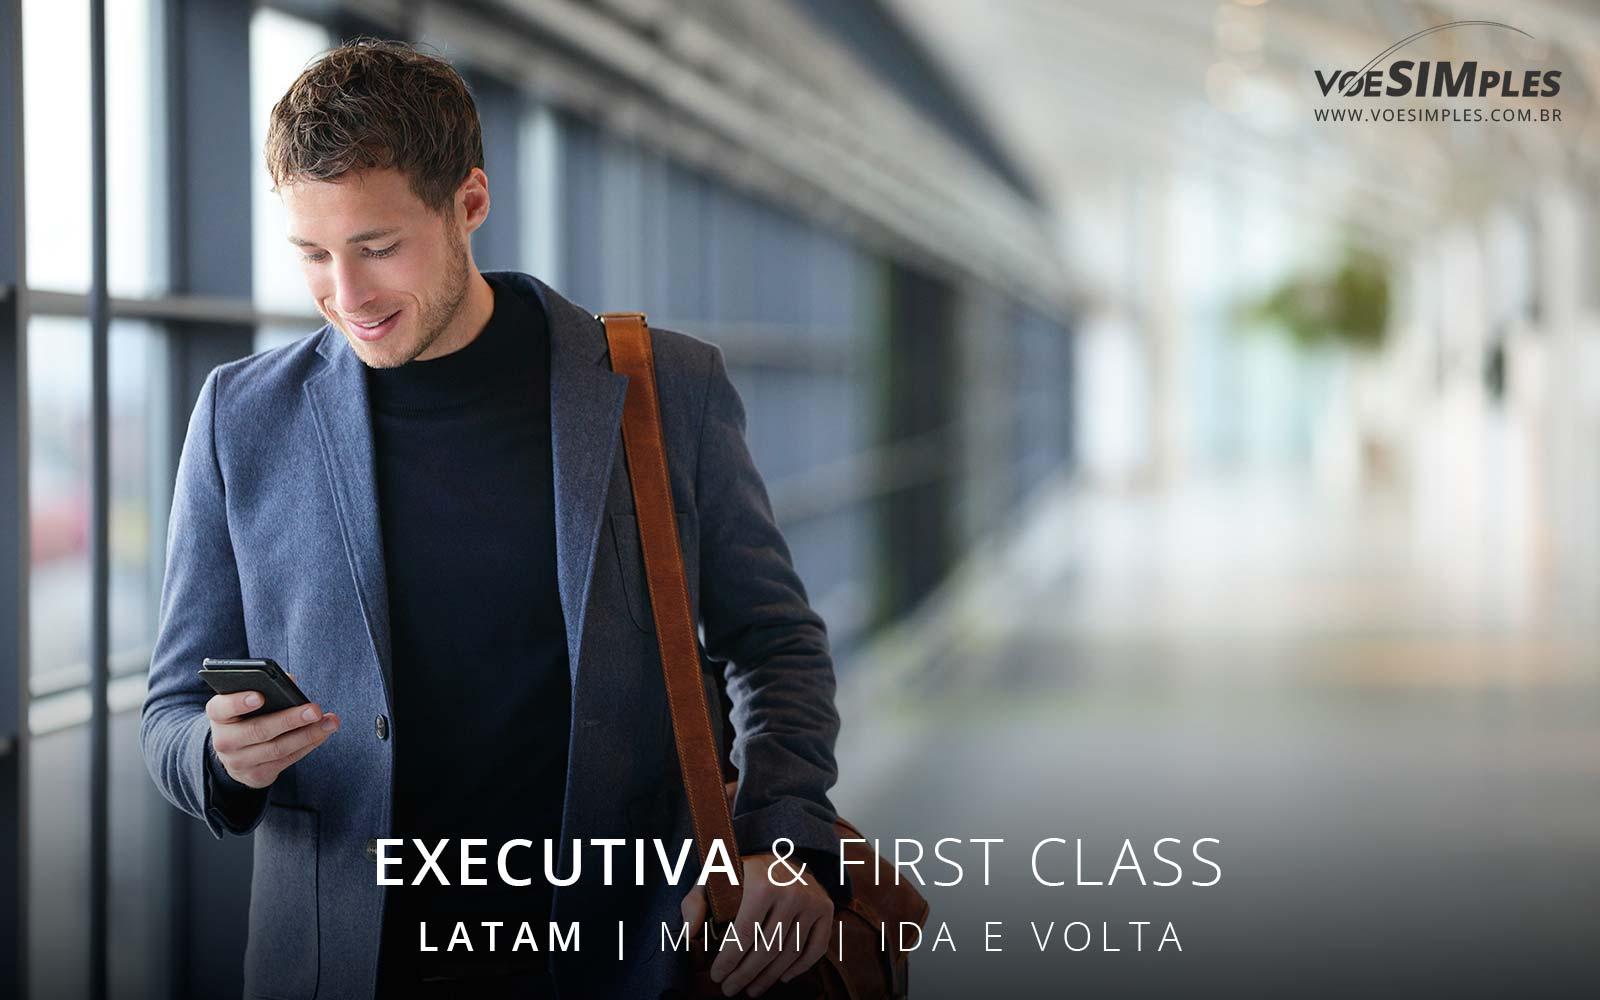 Passagem aérea Executiva Latam para Miami